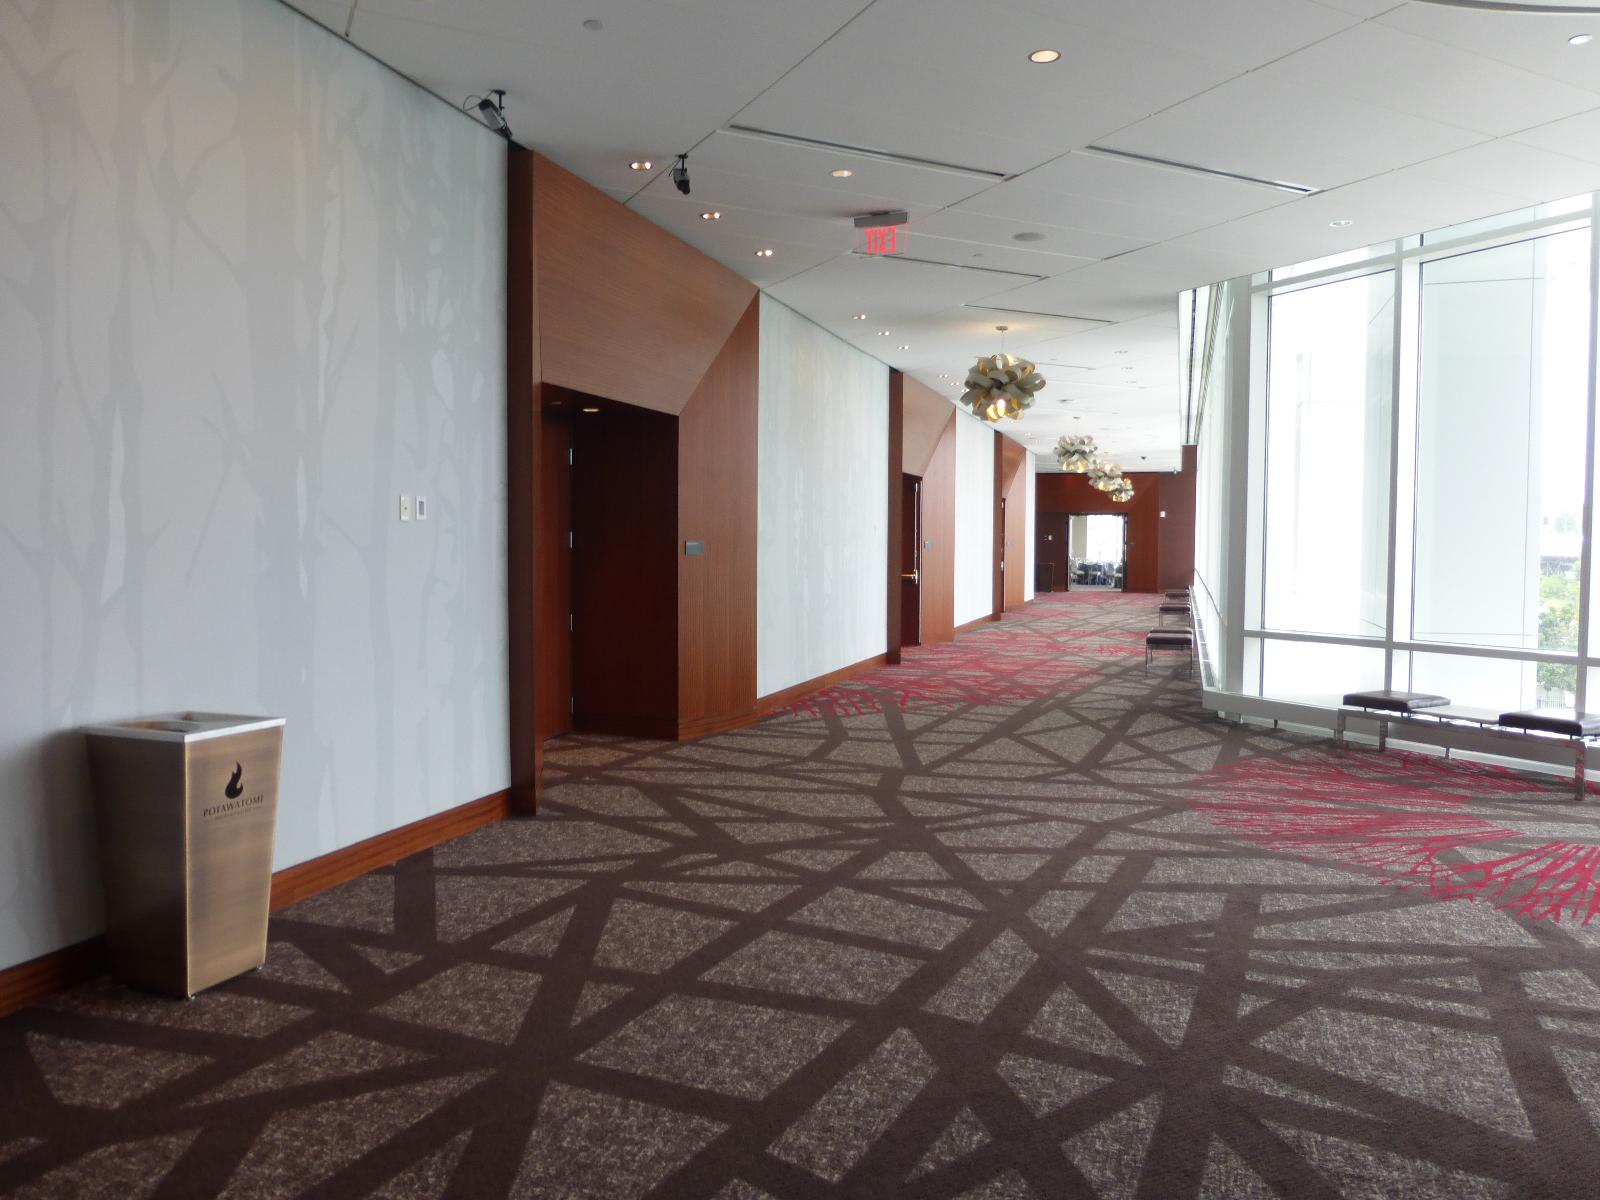 Interior hallway.